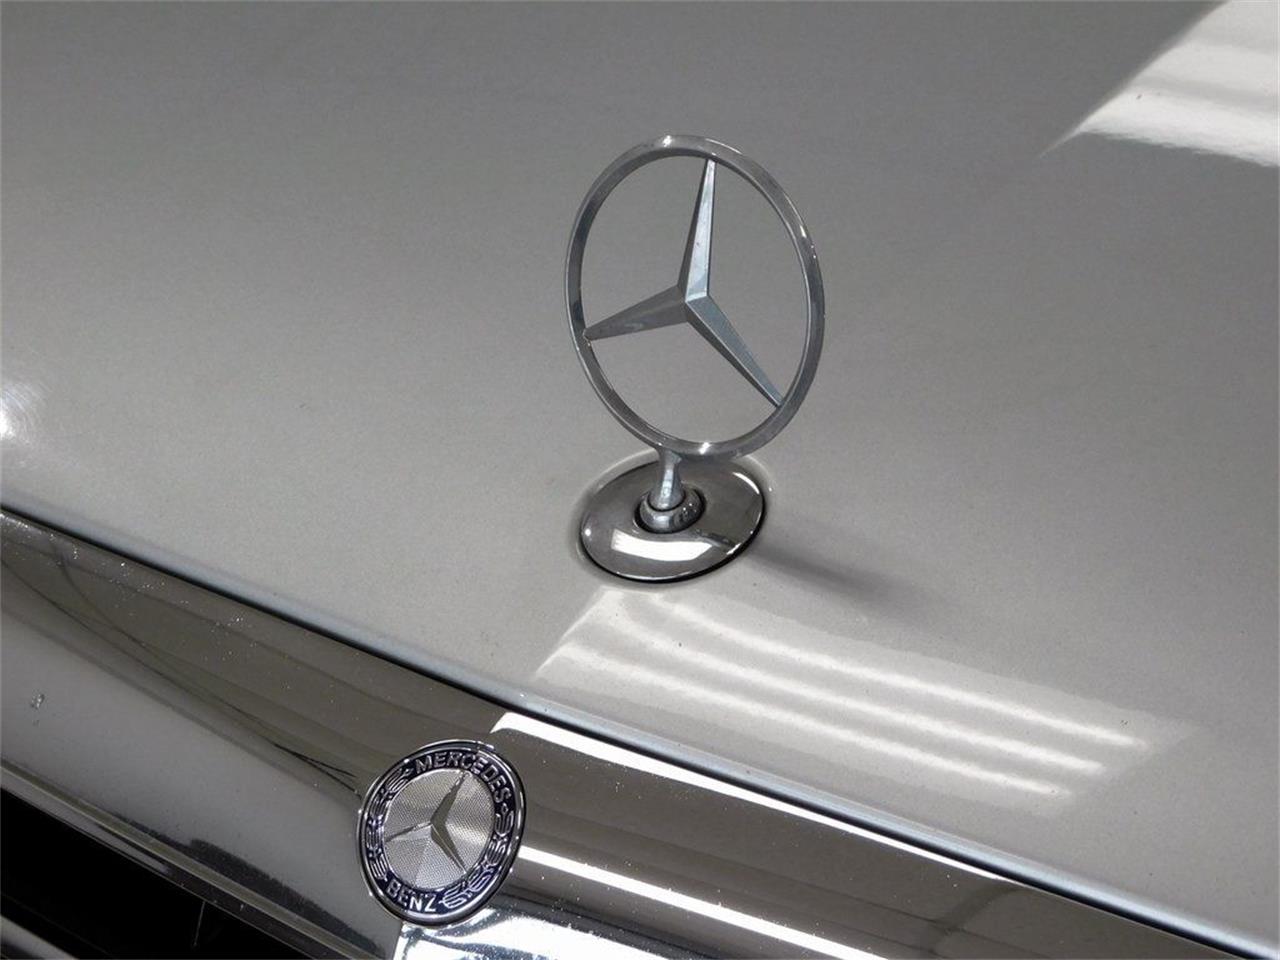 2008 Mercedes-Benz S-Class (CC-1220177) for sale in Hamburg, New York